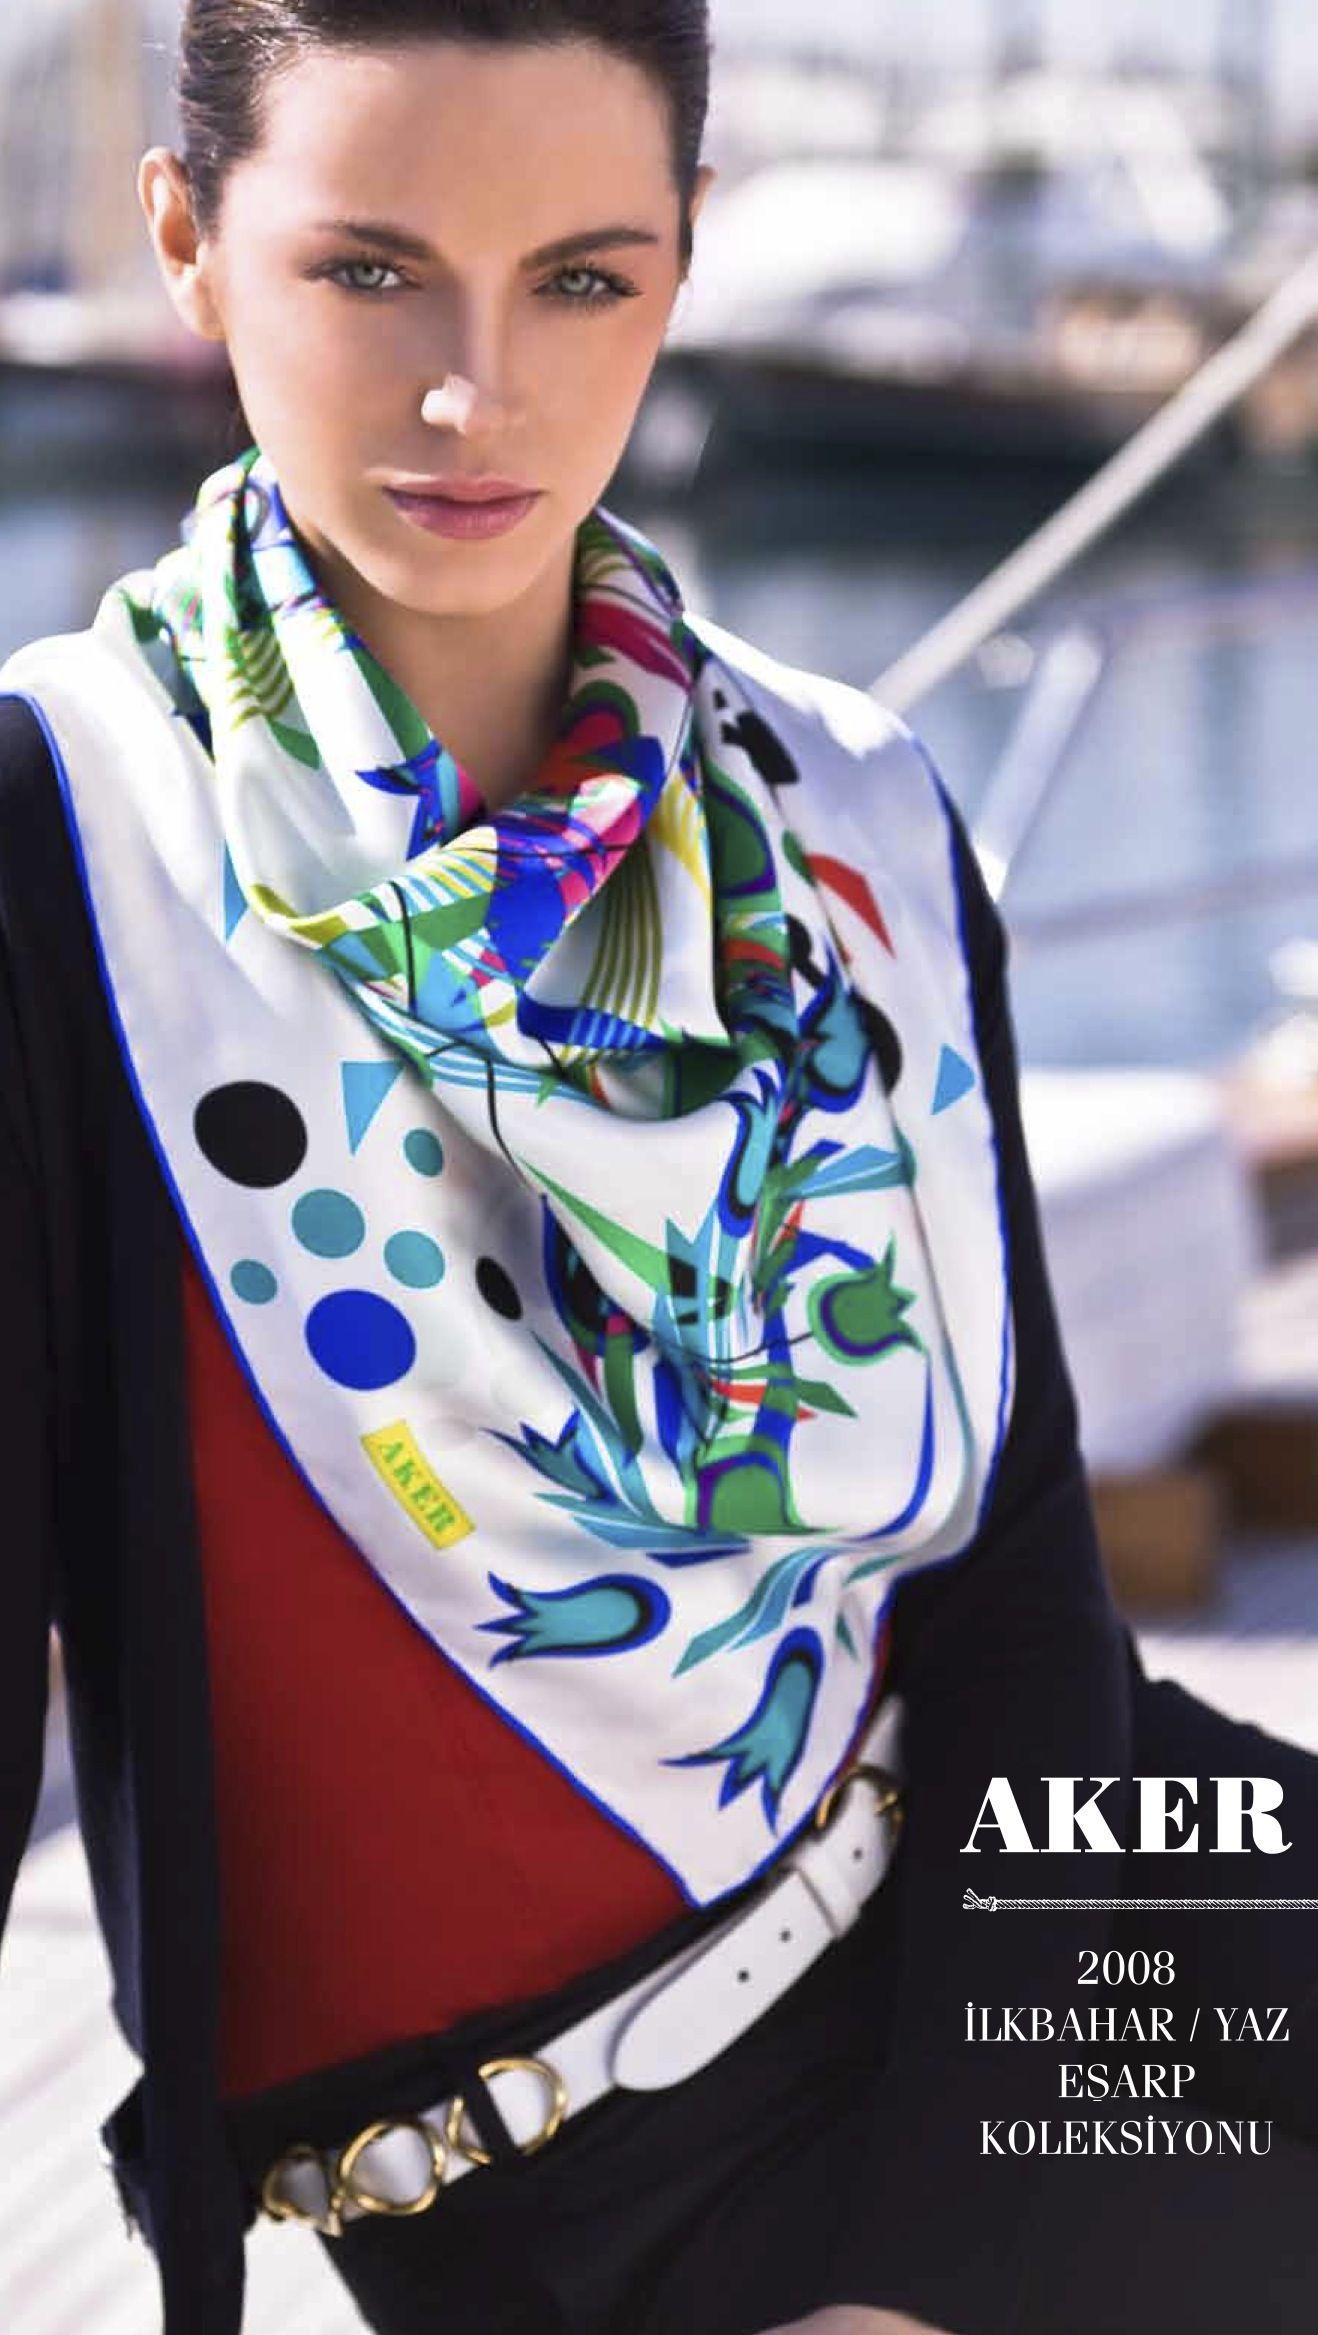 Aker Eşarp / Scarf - 2008 S/S #aker #scarf #esarp #hijab #fashion #silk #scarves #moda #hijab #tesettur #model #mode #style #pattern #babushka #kerchief #shawl #wrapper #trend #aker #akeresarp #akerscarf